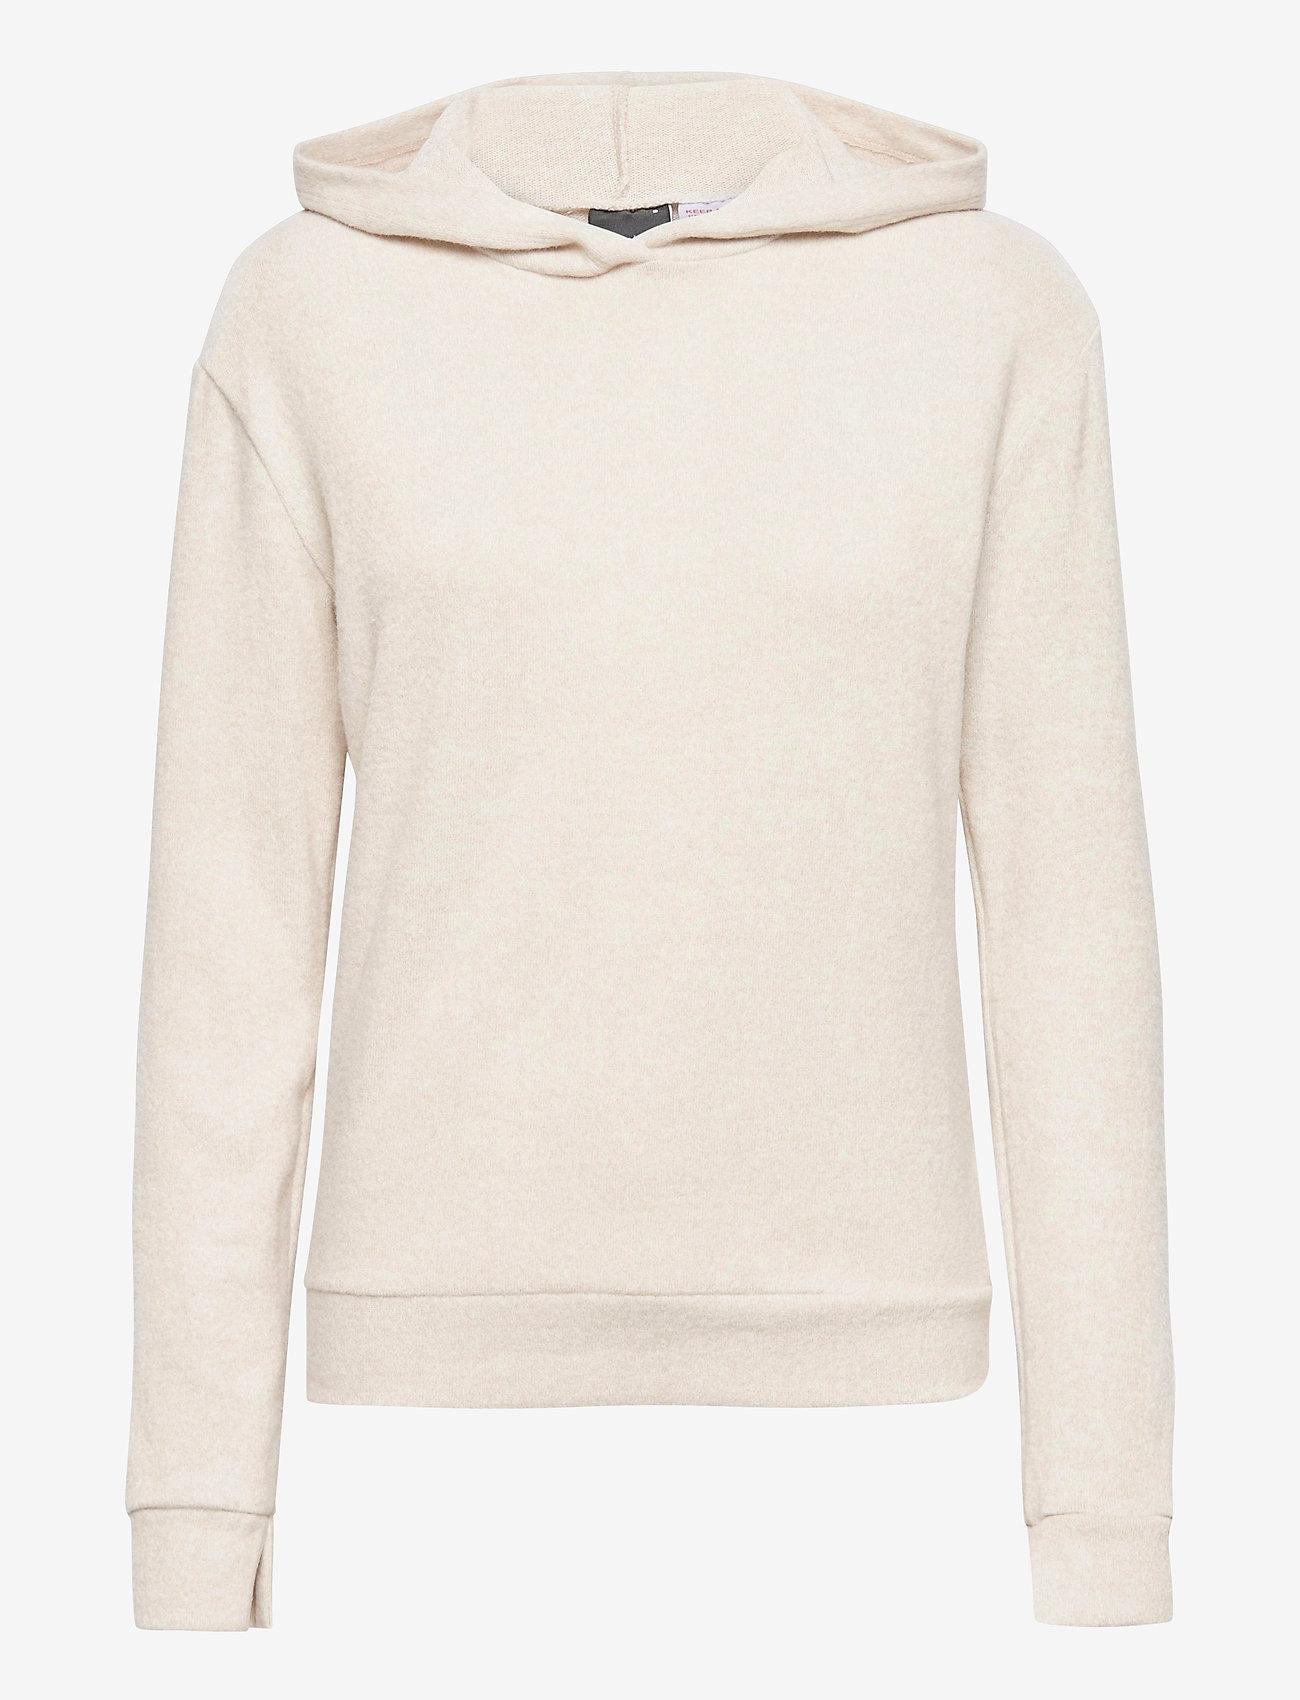 Gina Tricot - Alicia hoodie - hættetrøjer - beige (1040) - 0